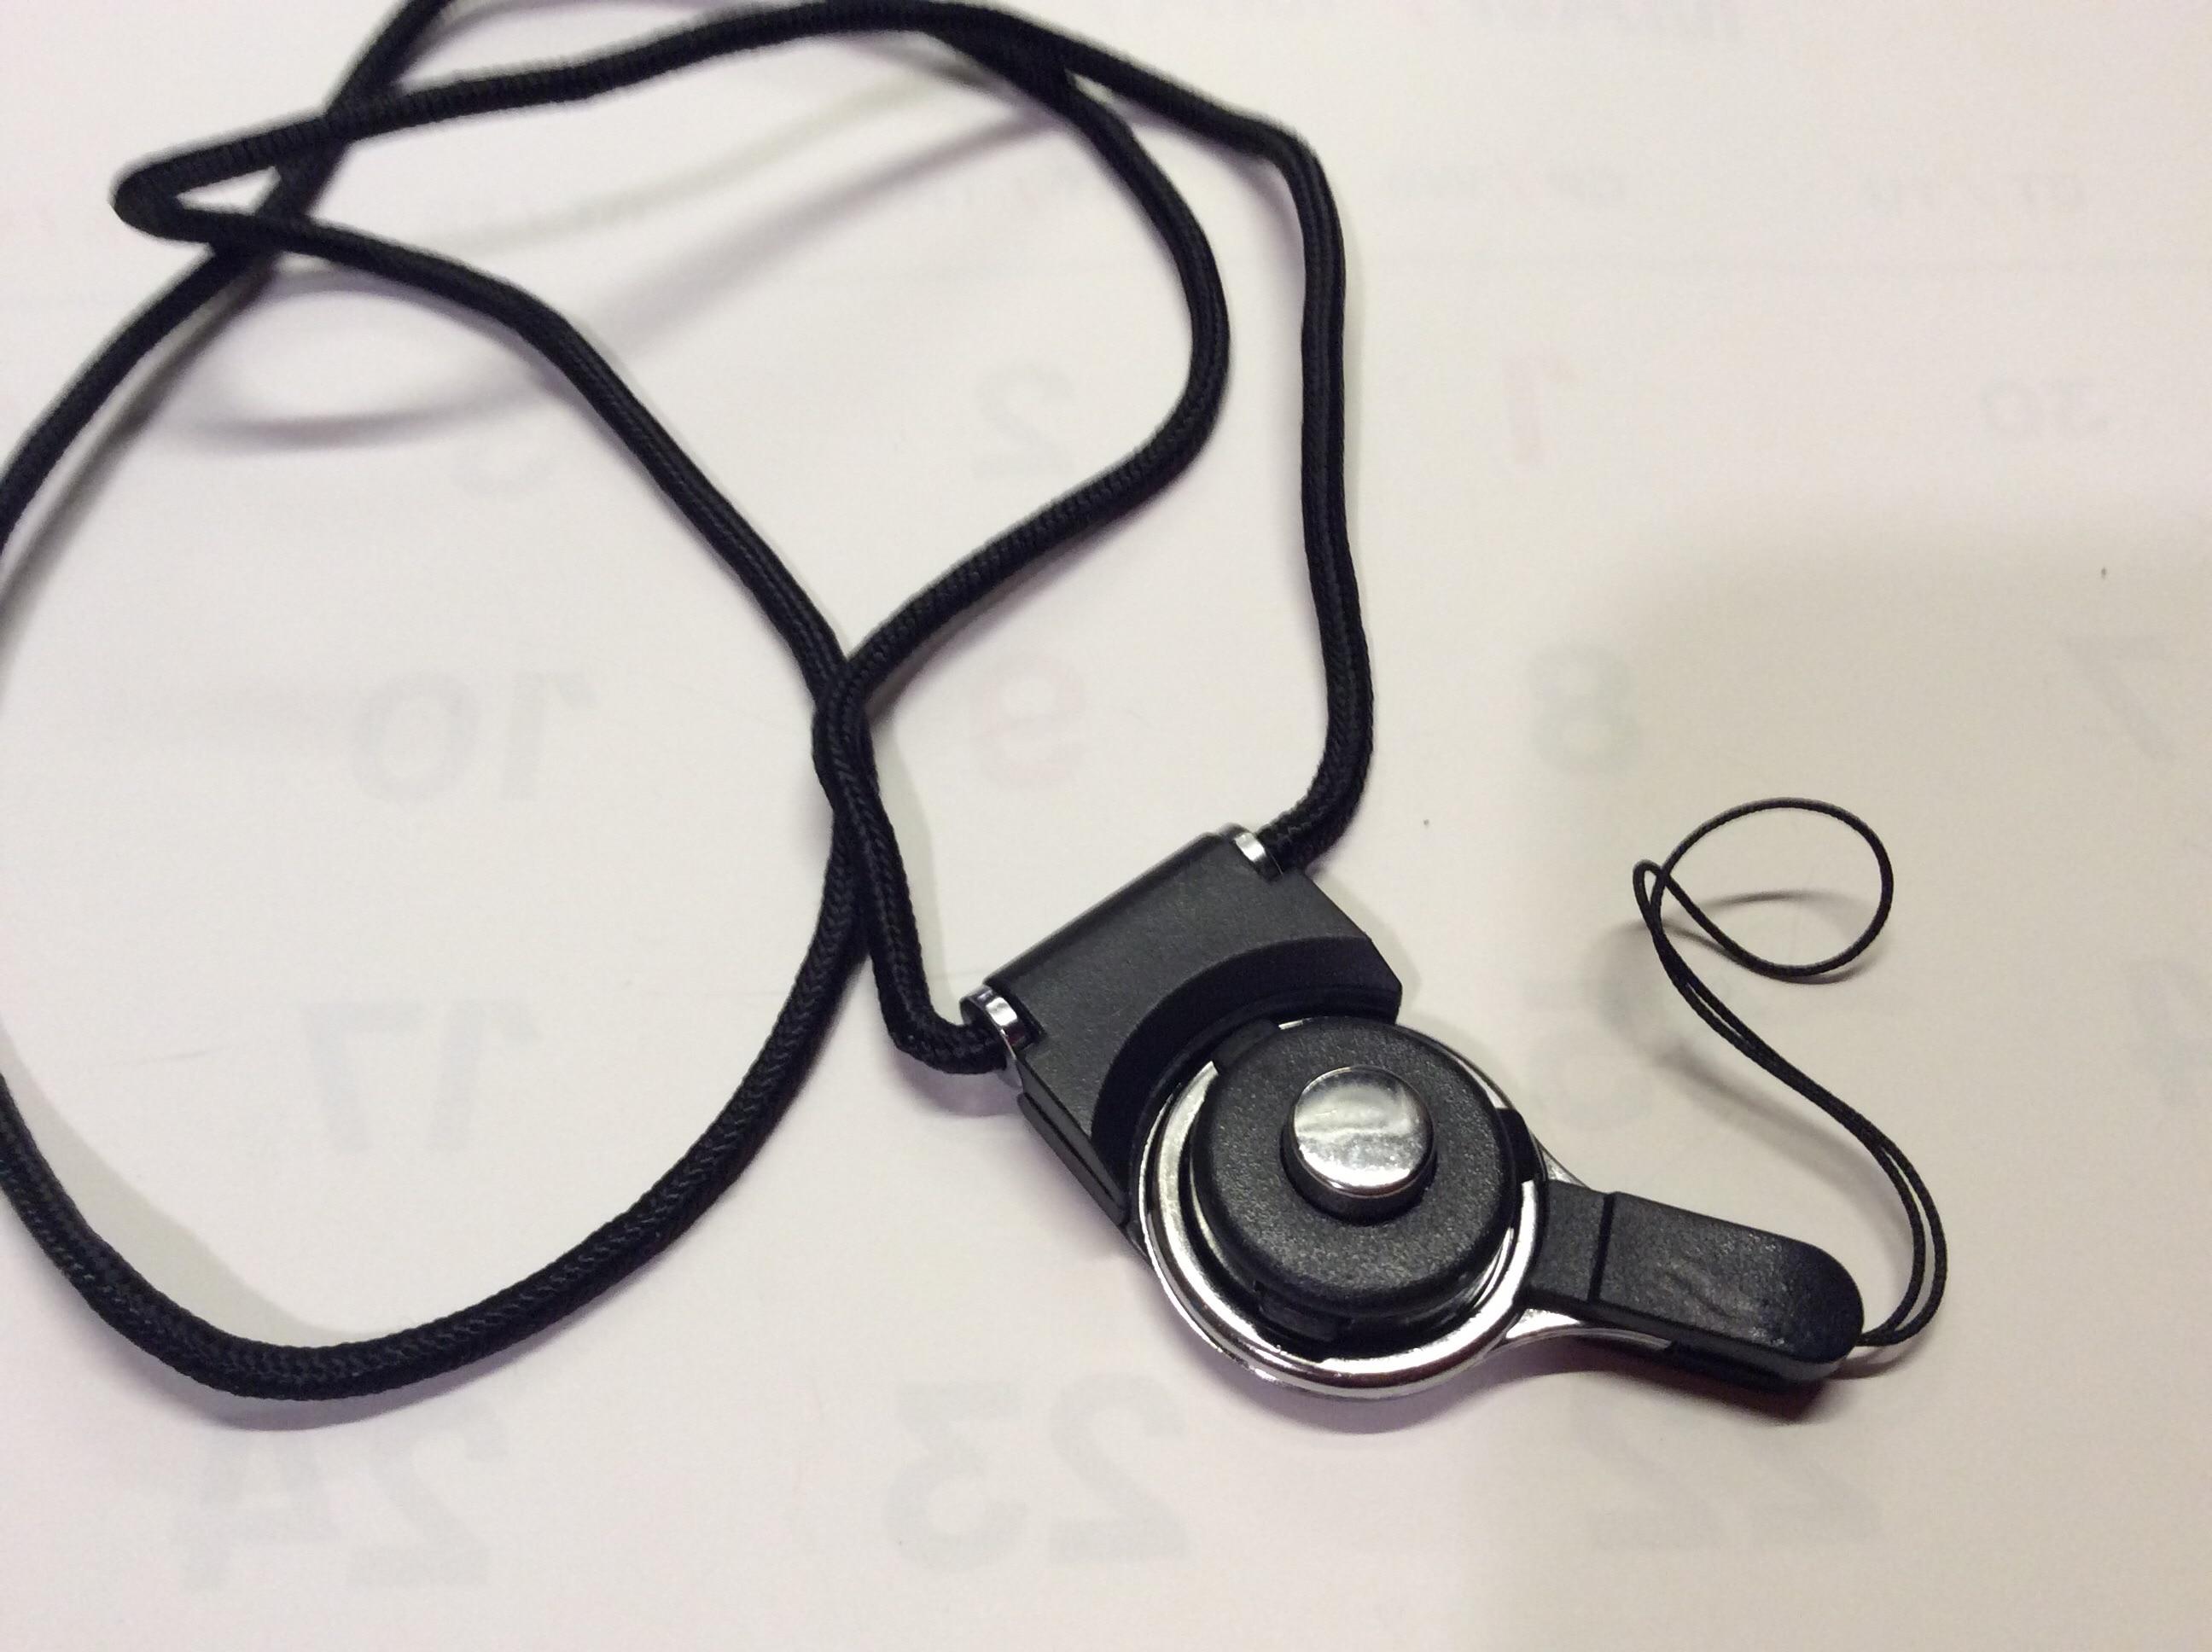 Mobile Phone Neckband